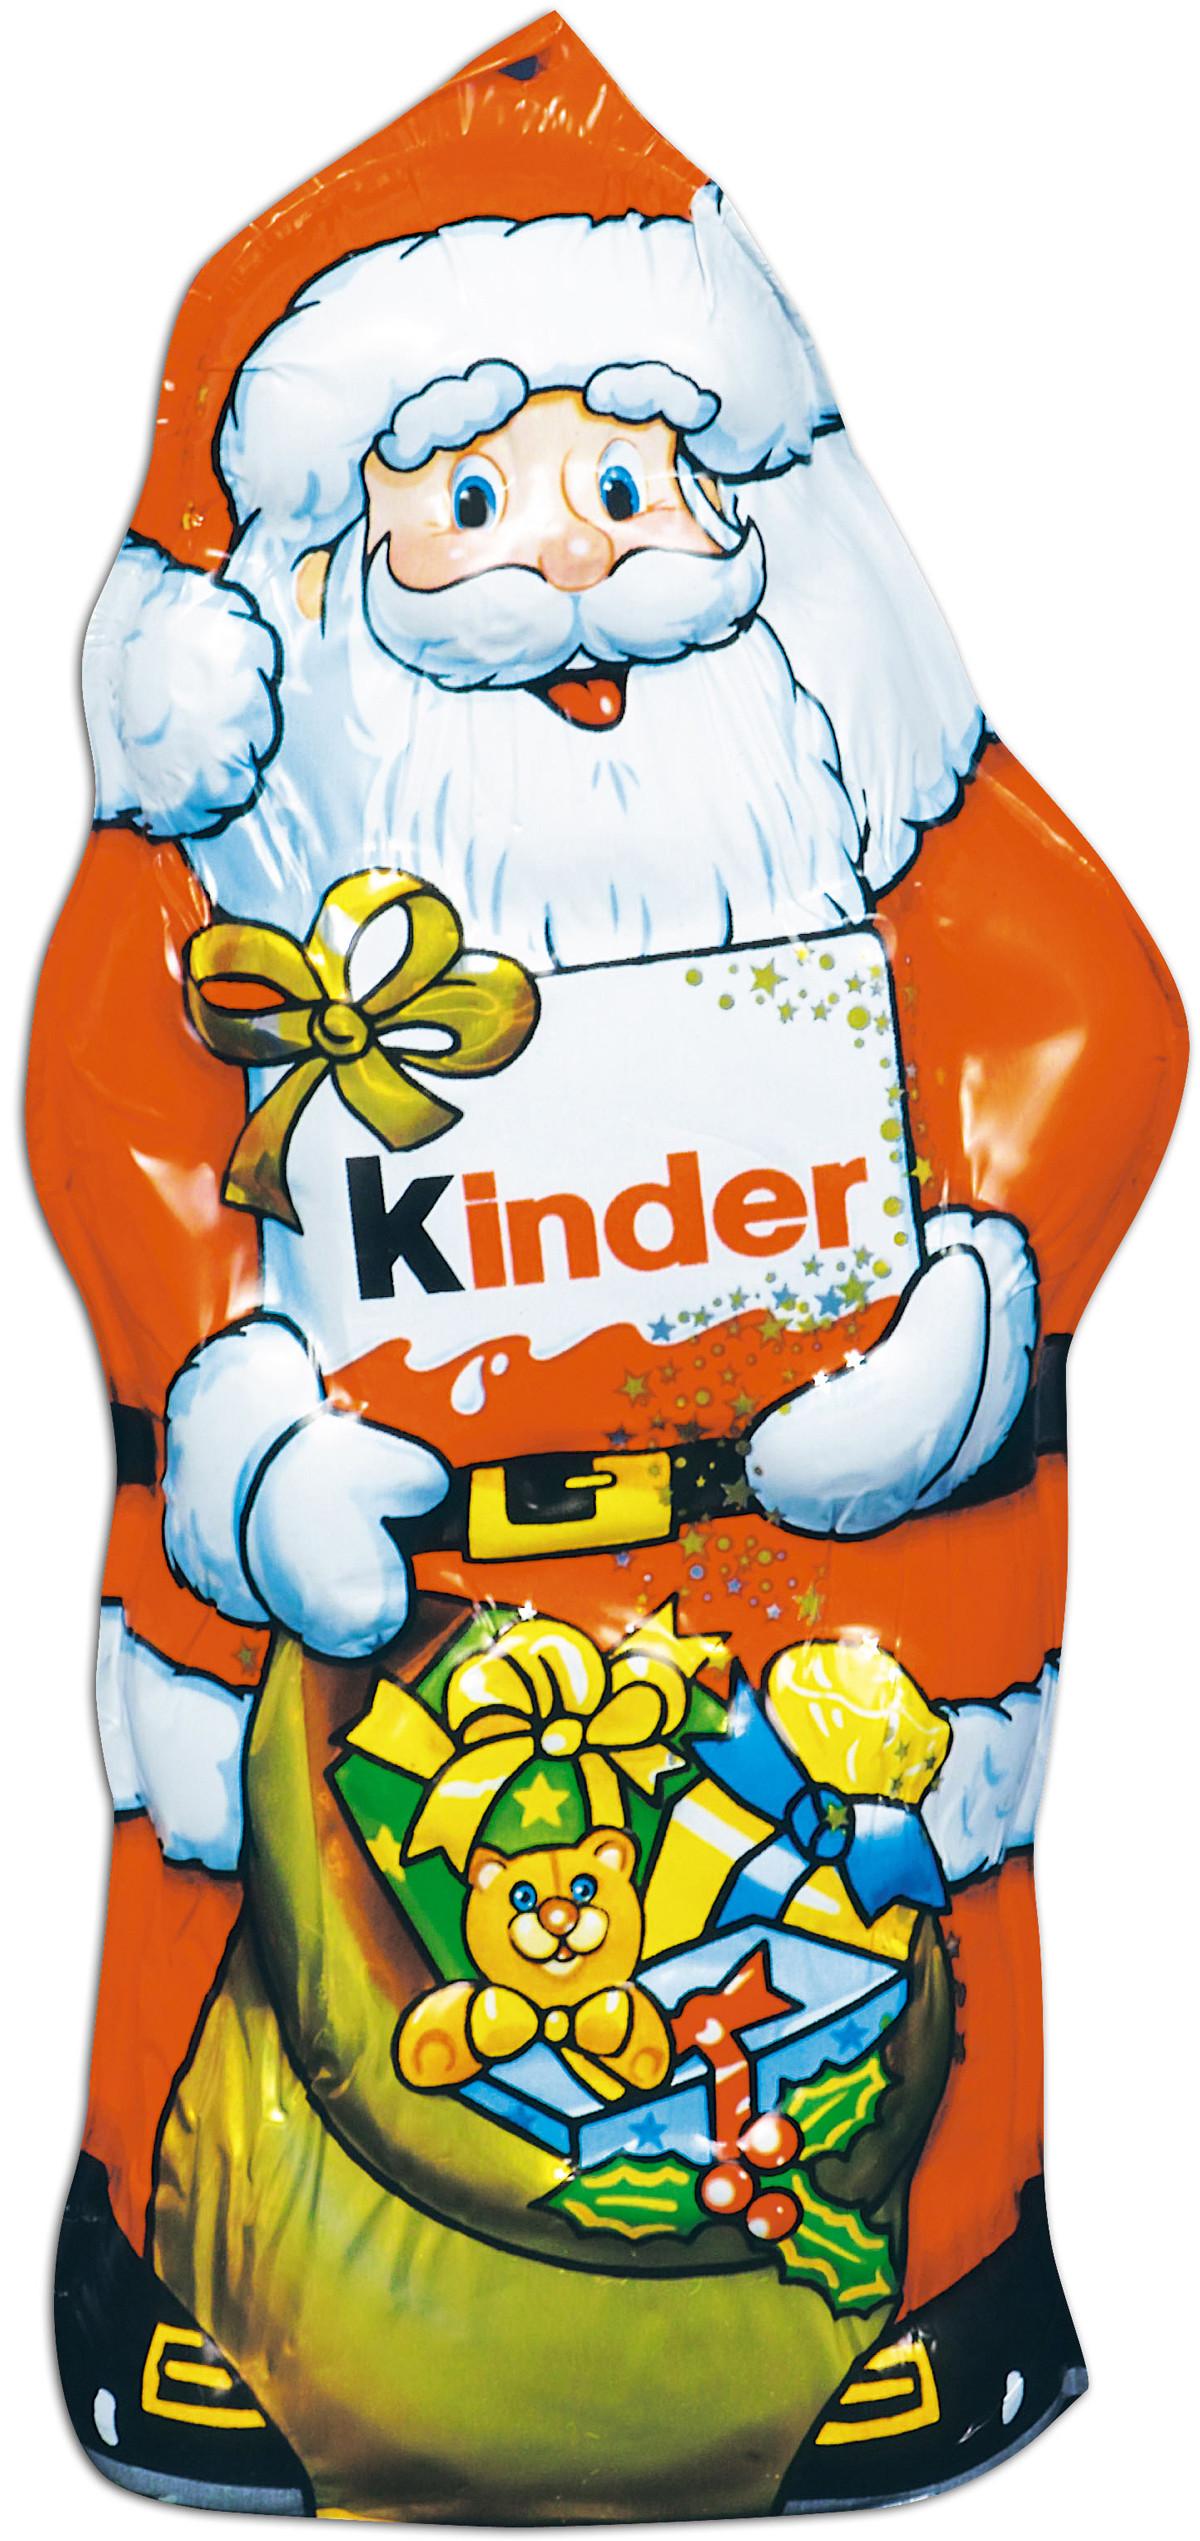 Десерты Kinder Kinder «Дед Мороз» молочный фигурный 110 г коркунов ассорти конфеты молочный шоколад 110 г